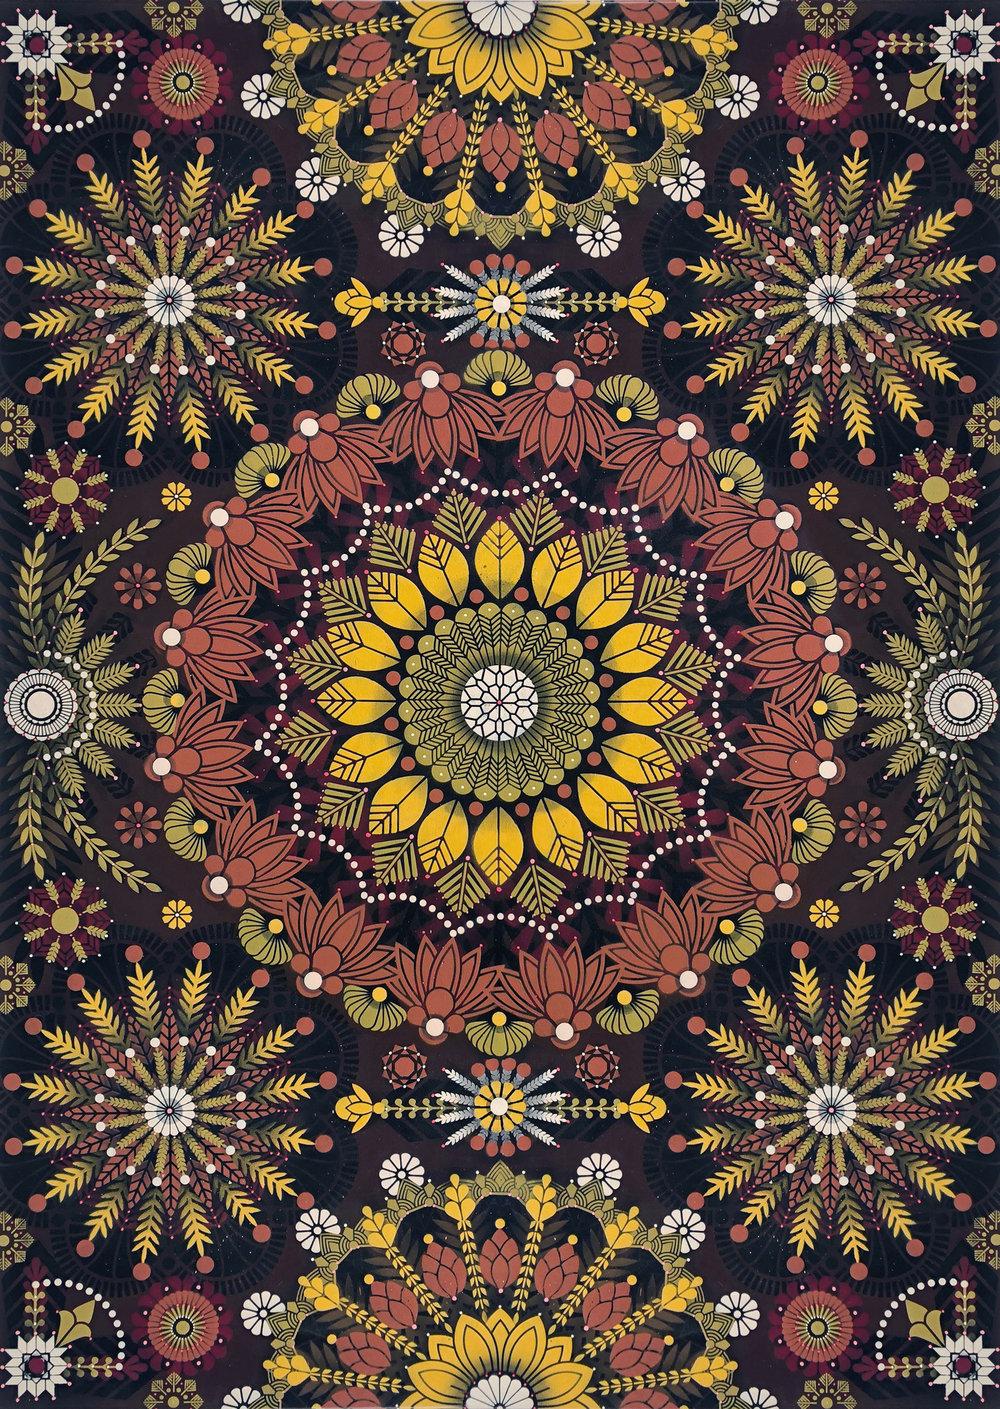 """ Kaleidoscopic Nature #1 "" Acrylic on canvas - 162 x 114 cm   2018"